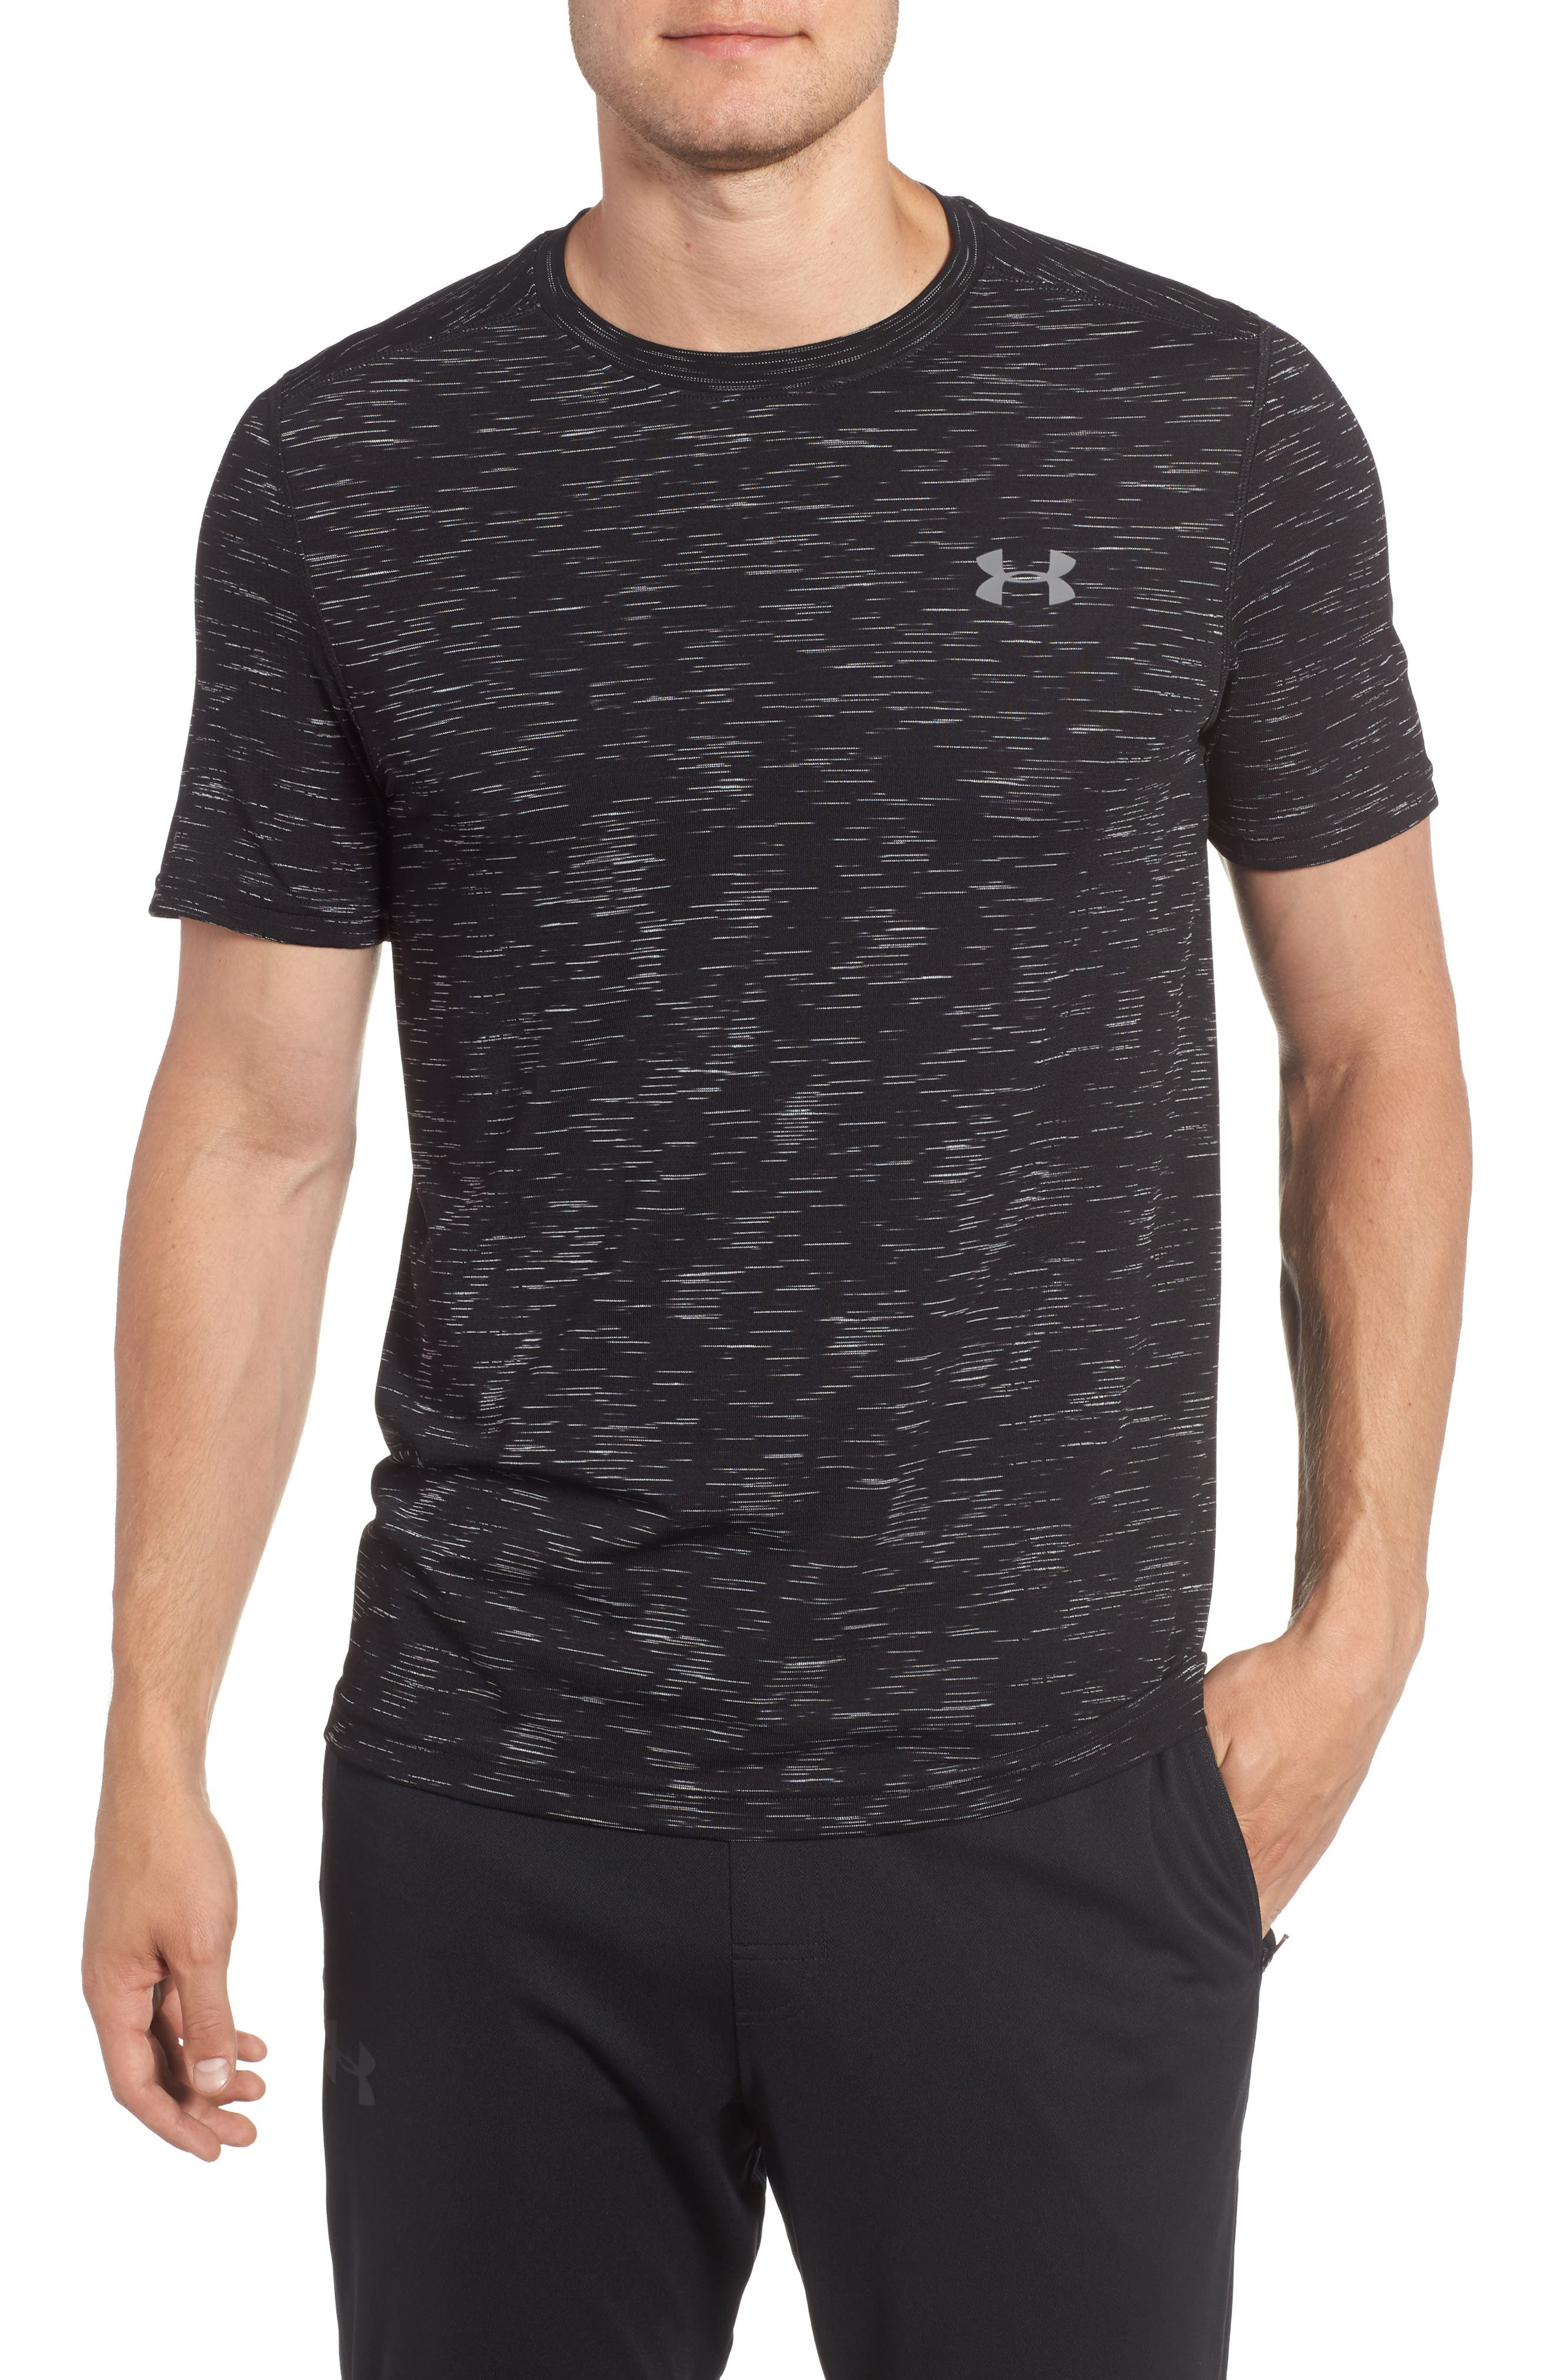 Threadborne Regular Fit T-Shirt,                             Main thumbnail 1, color,                             Black / Graphite